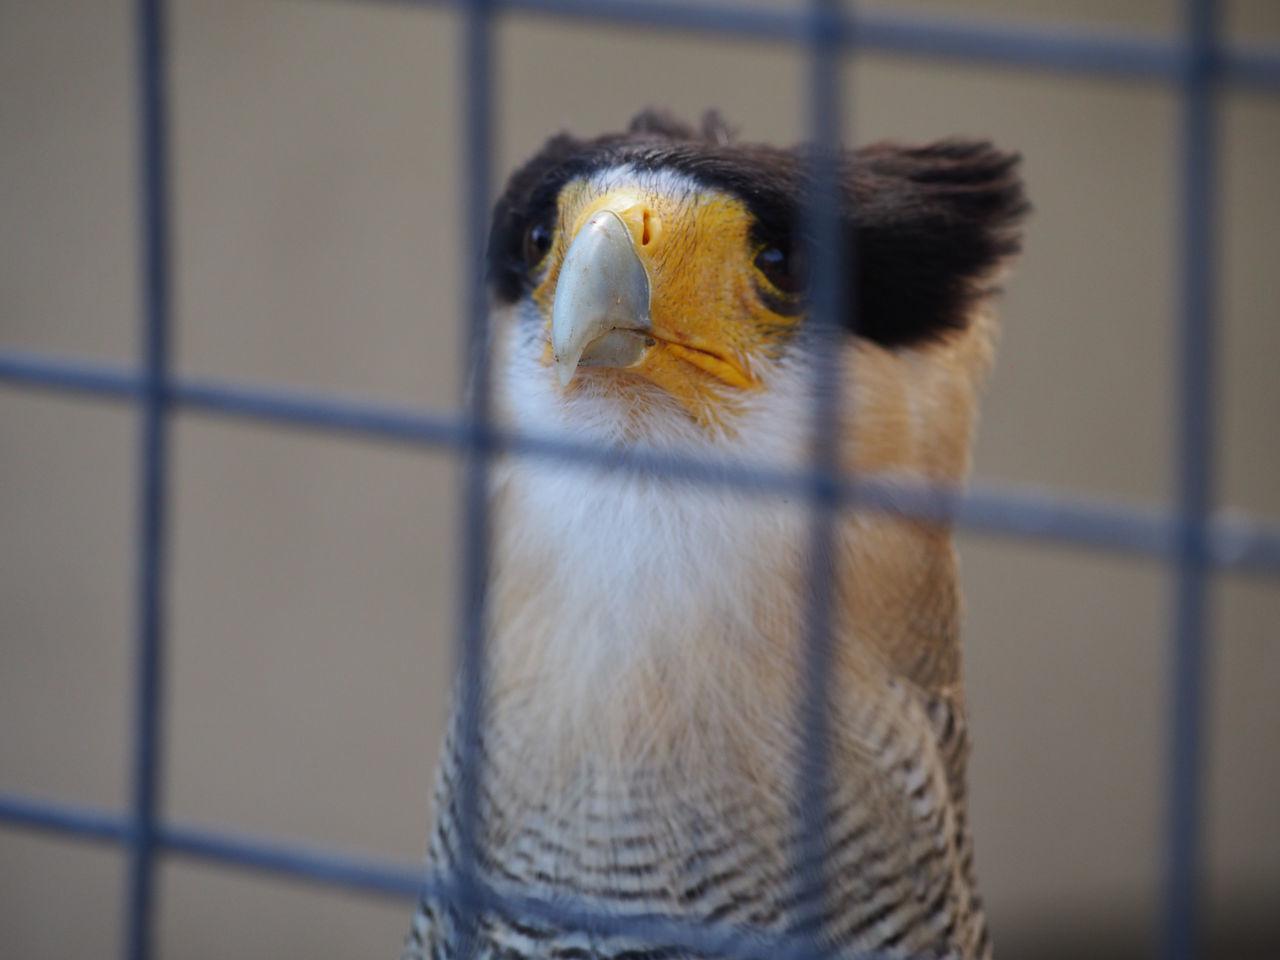 Beak Bird In Captivity CaraCara Helmsley Loud Call National Centre For Birds Of Prey Nature